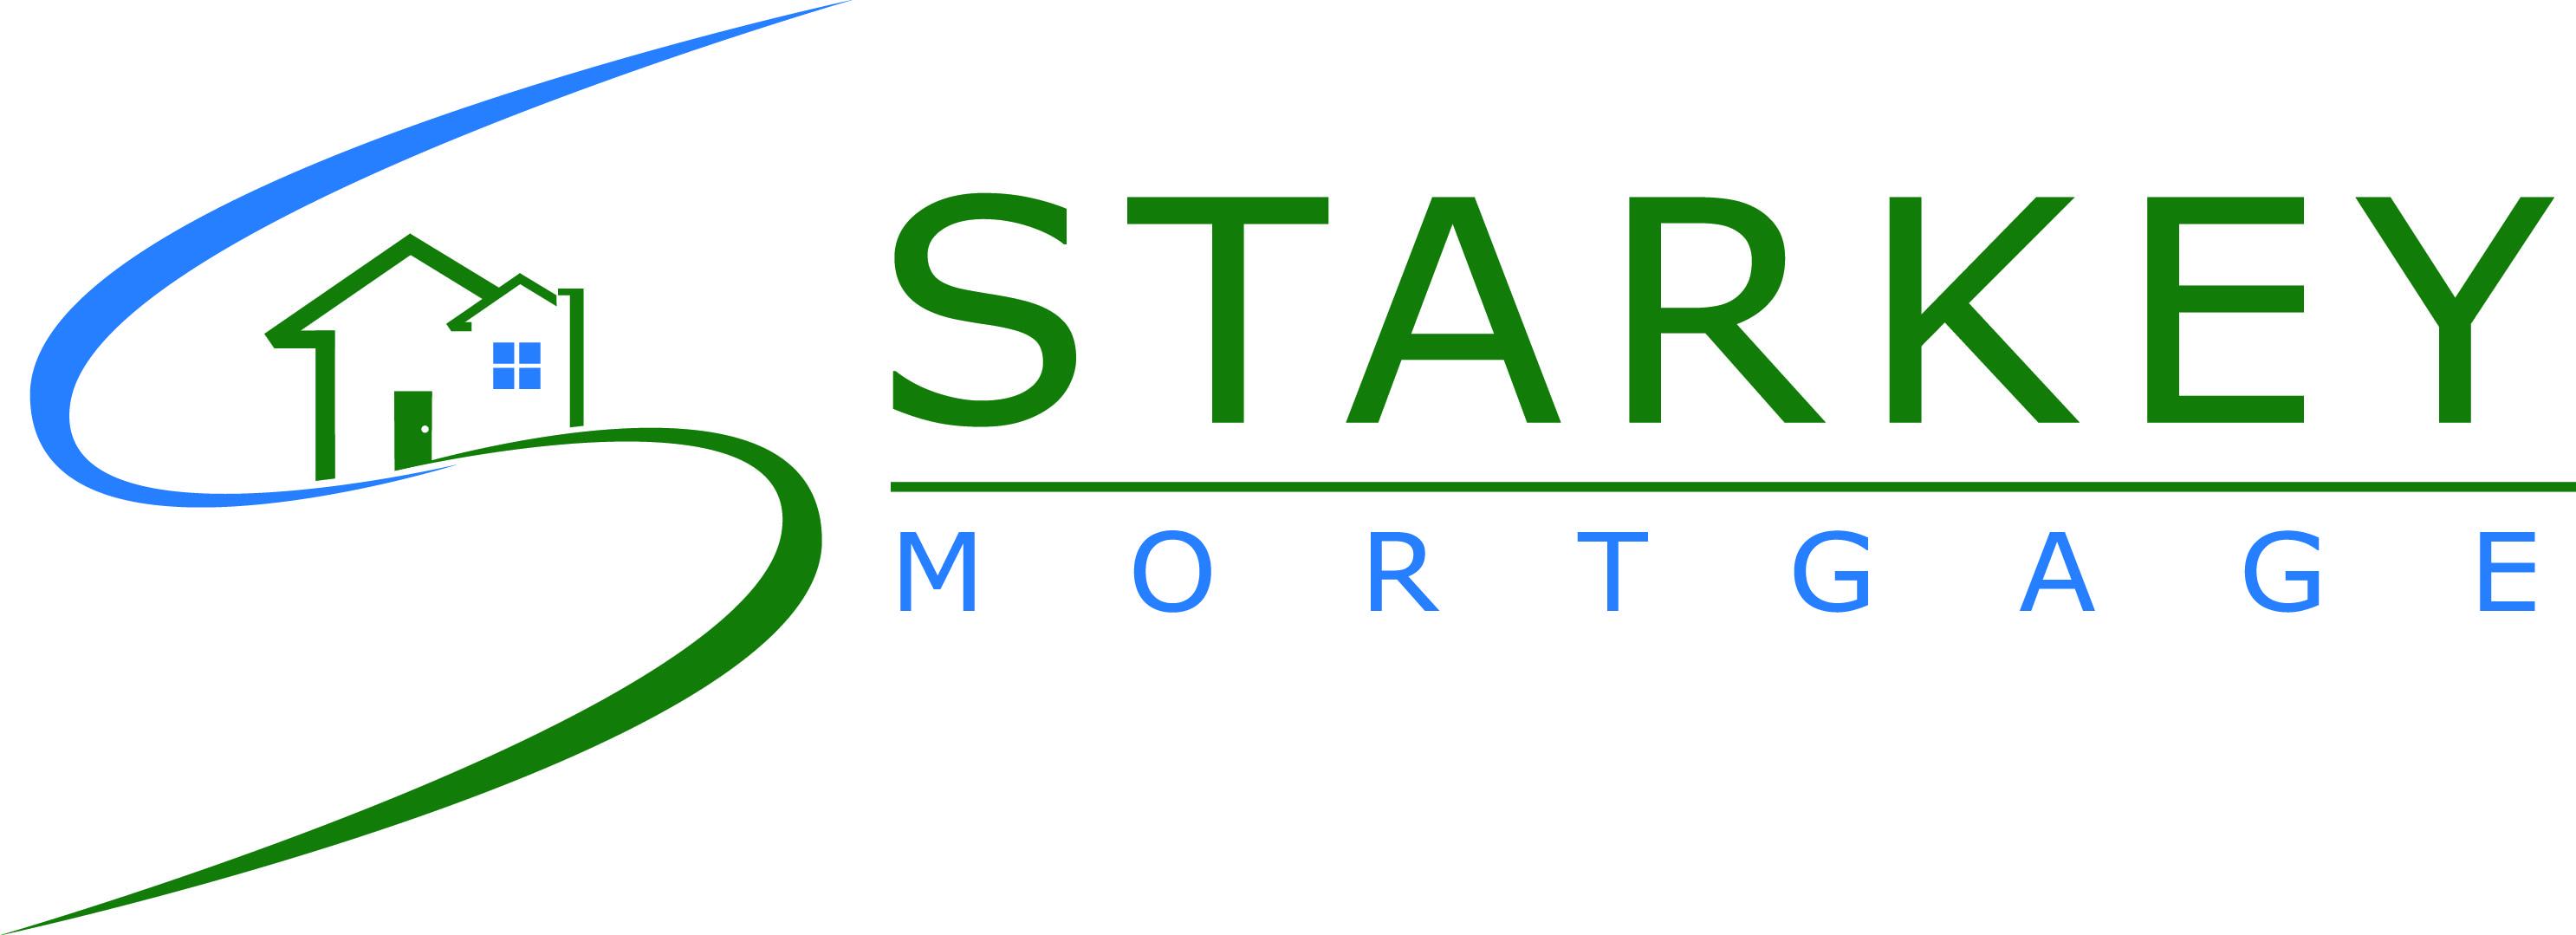 Starkey Mortgage Launches Argos Management and Marketing ...